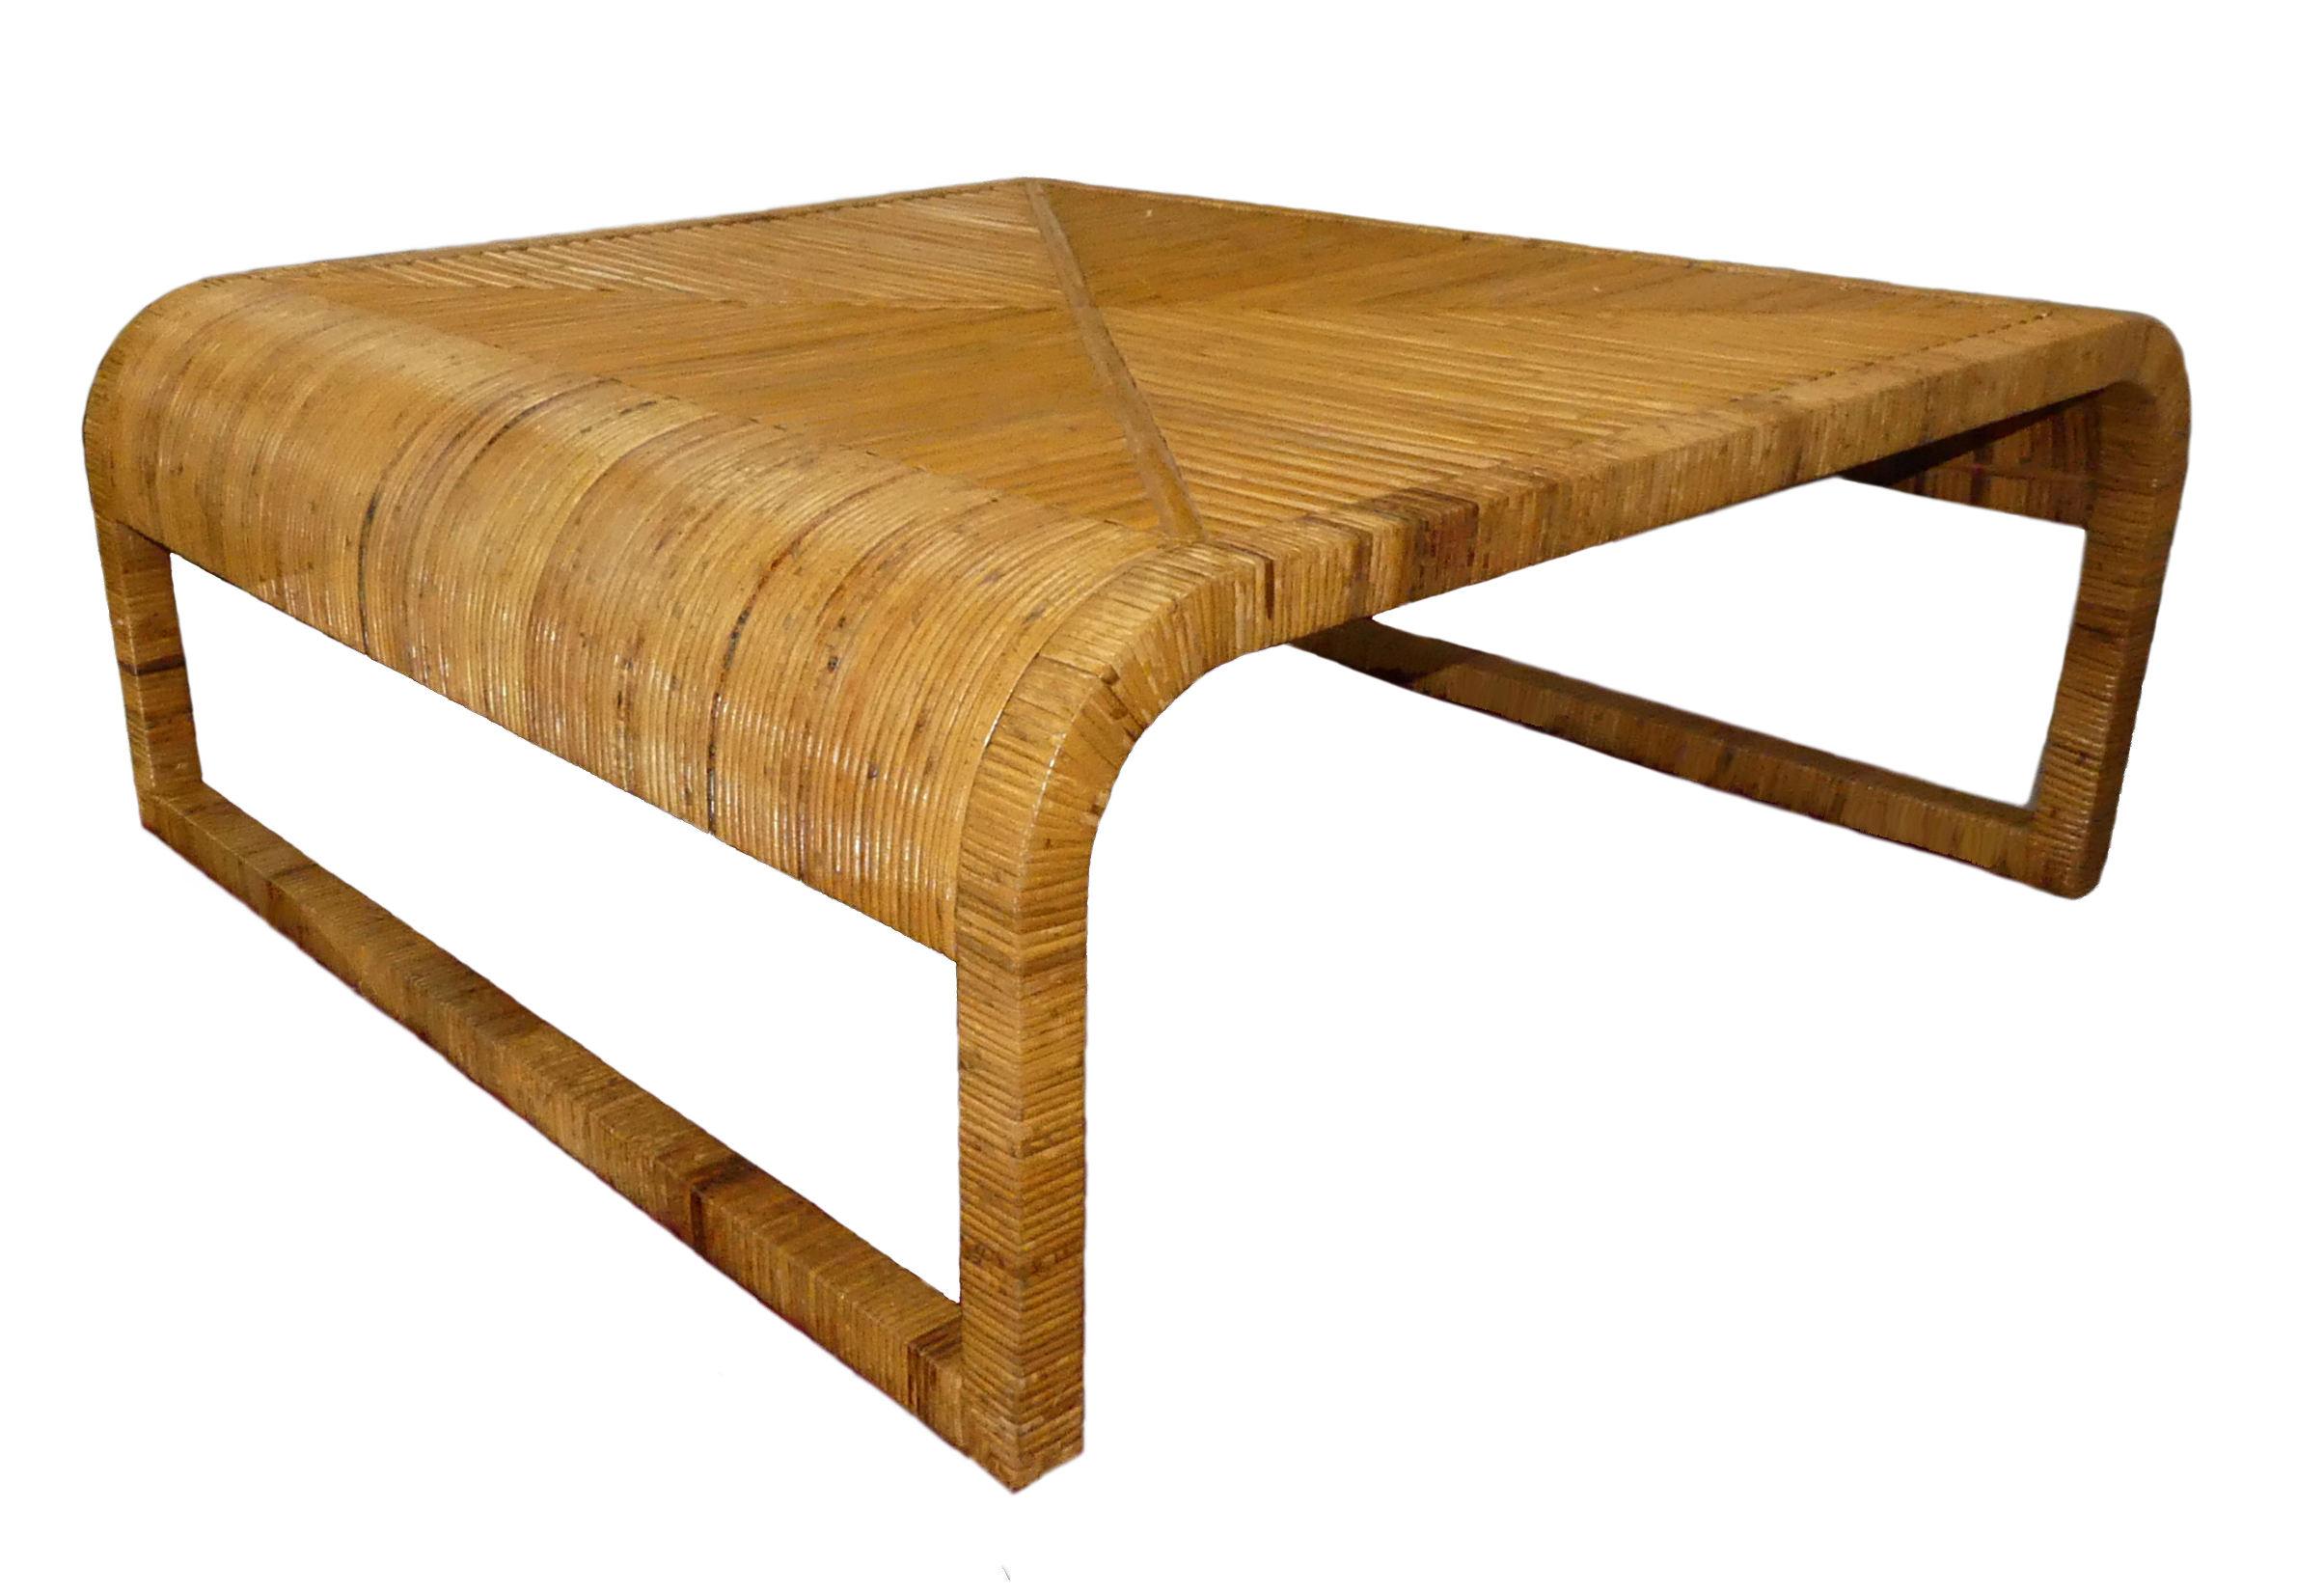 Vintage Mid-Century Modern Bamboo Waterfall Coffee Table